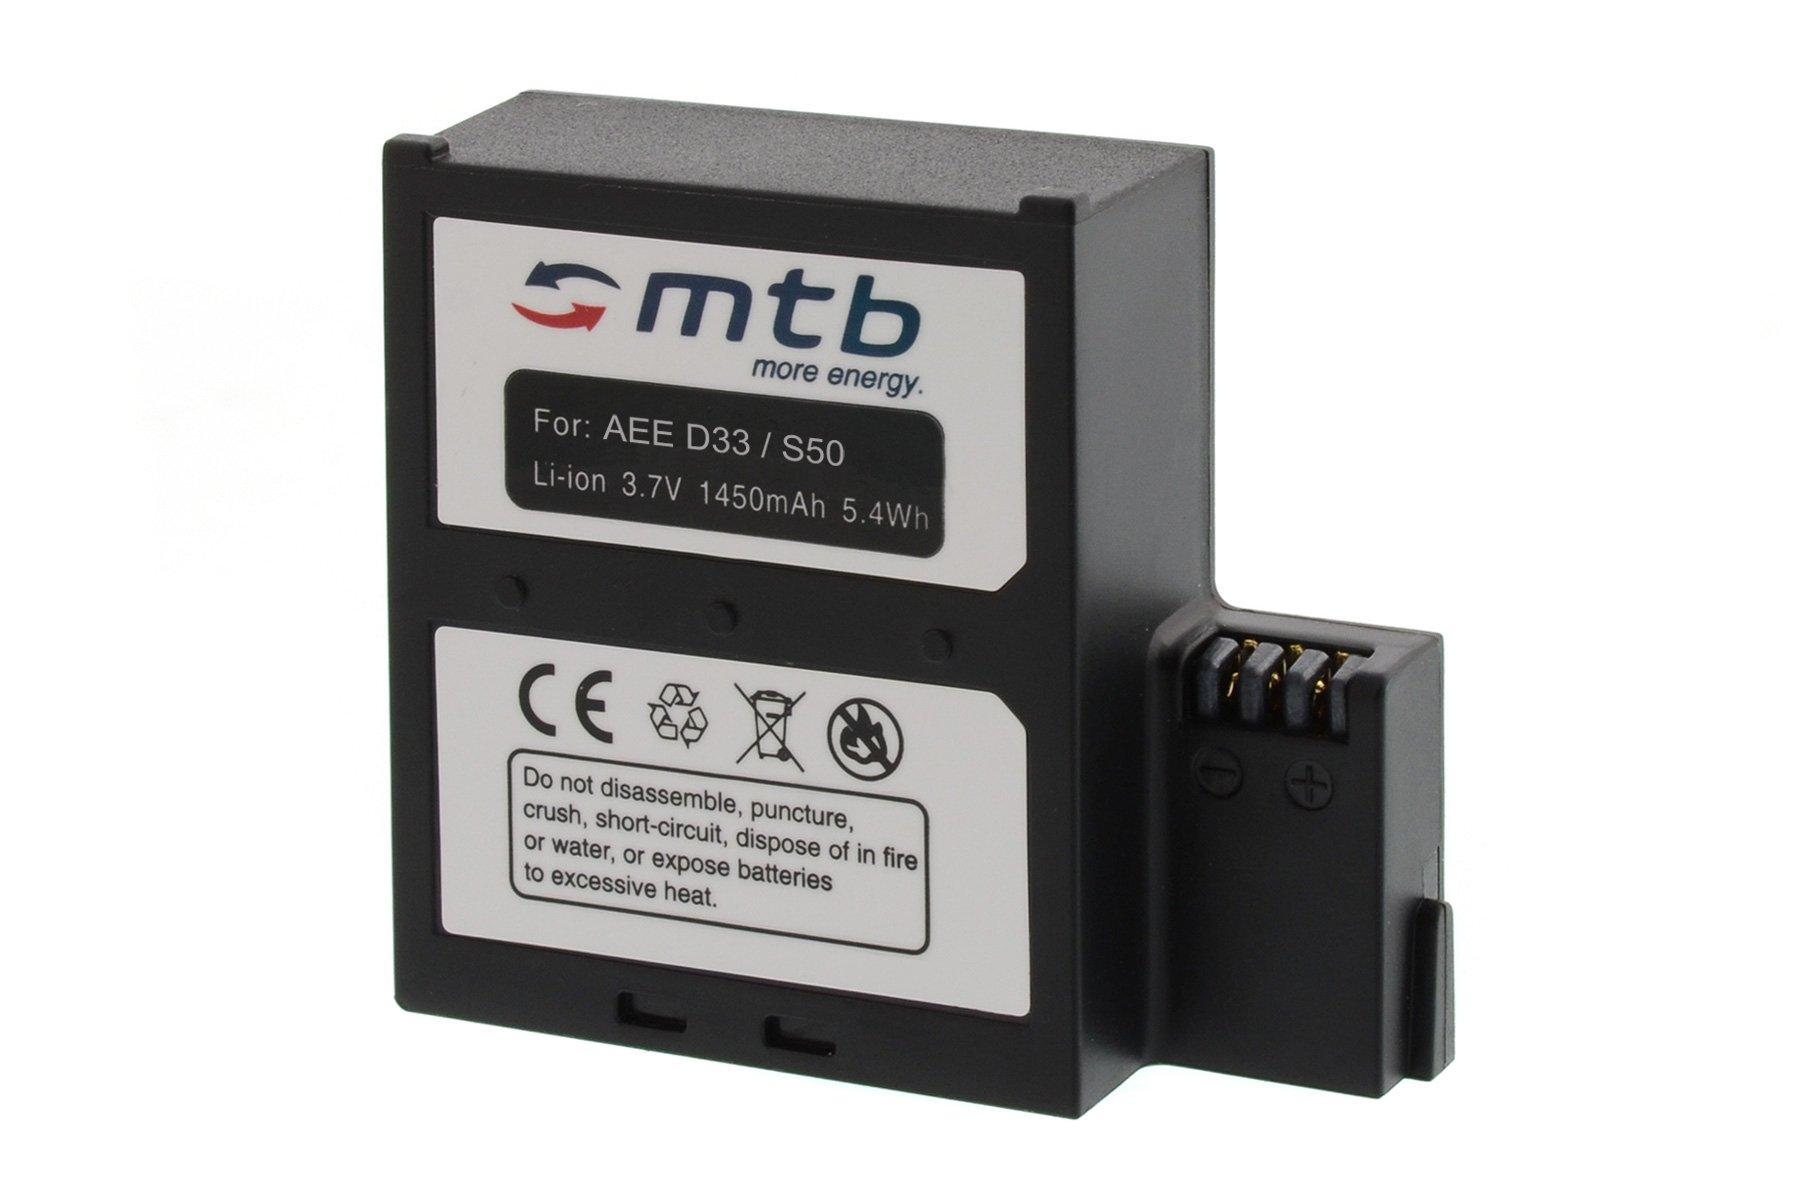 Battery for AEE Magicam S51, S70 Extreme/Light, S71 (WiFi), S80, S90 / Veho MUVI K2